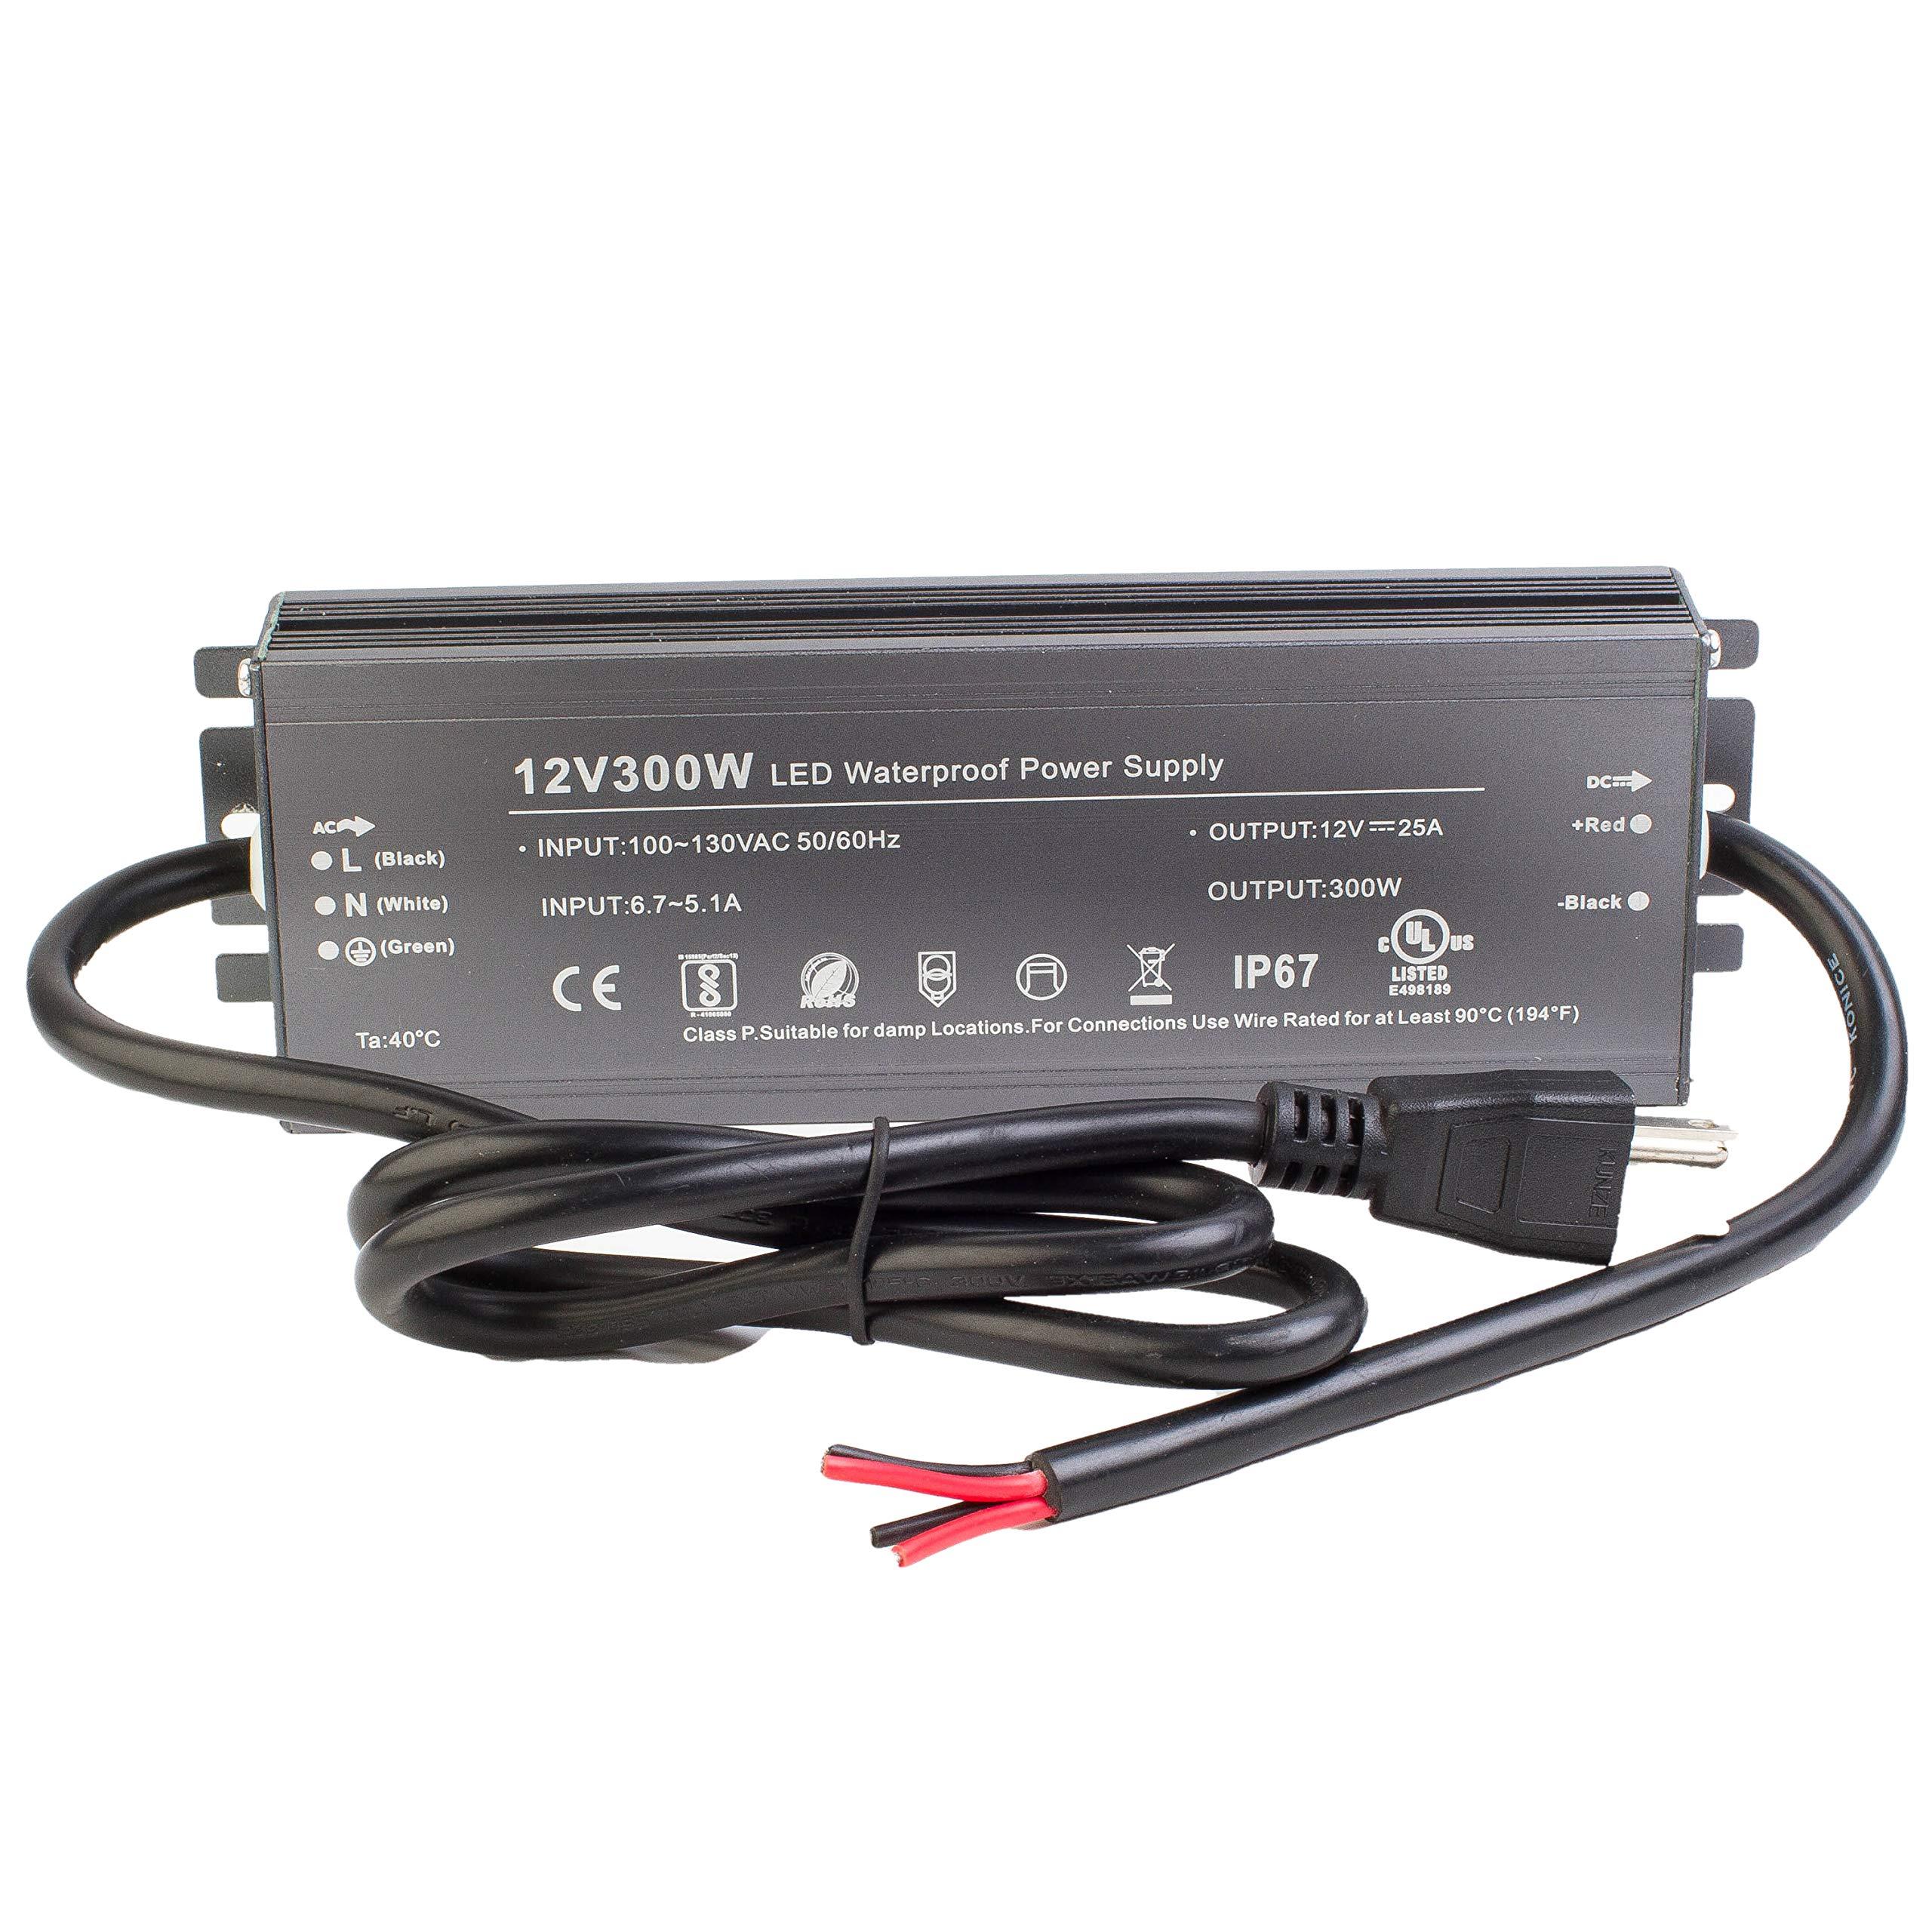 LEDUPDATES UL listed 300w LED Strip light Power Supply Driver Transformer 110v to DC Output for LED Light & CCTV (12V)